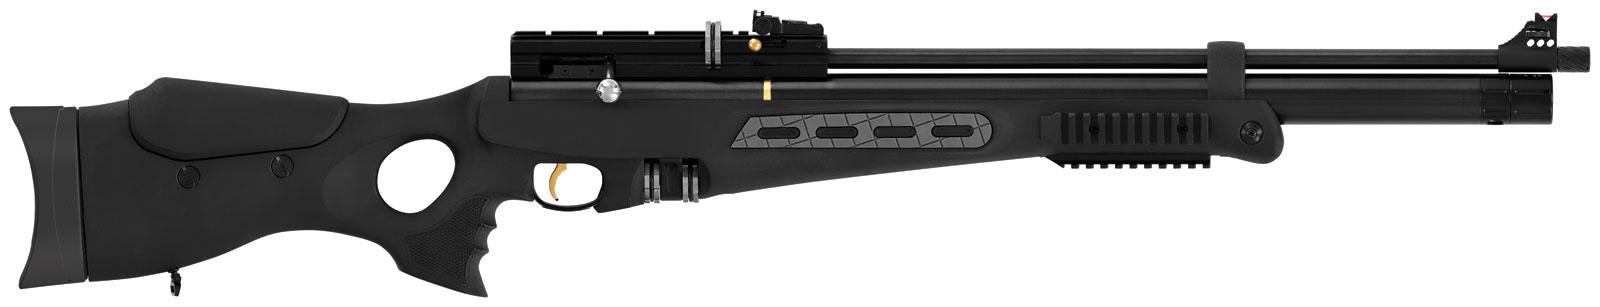 BT65SB Elite